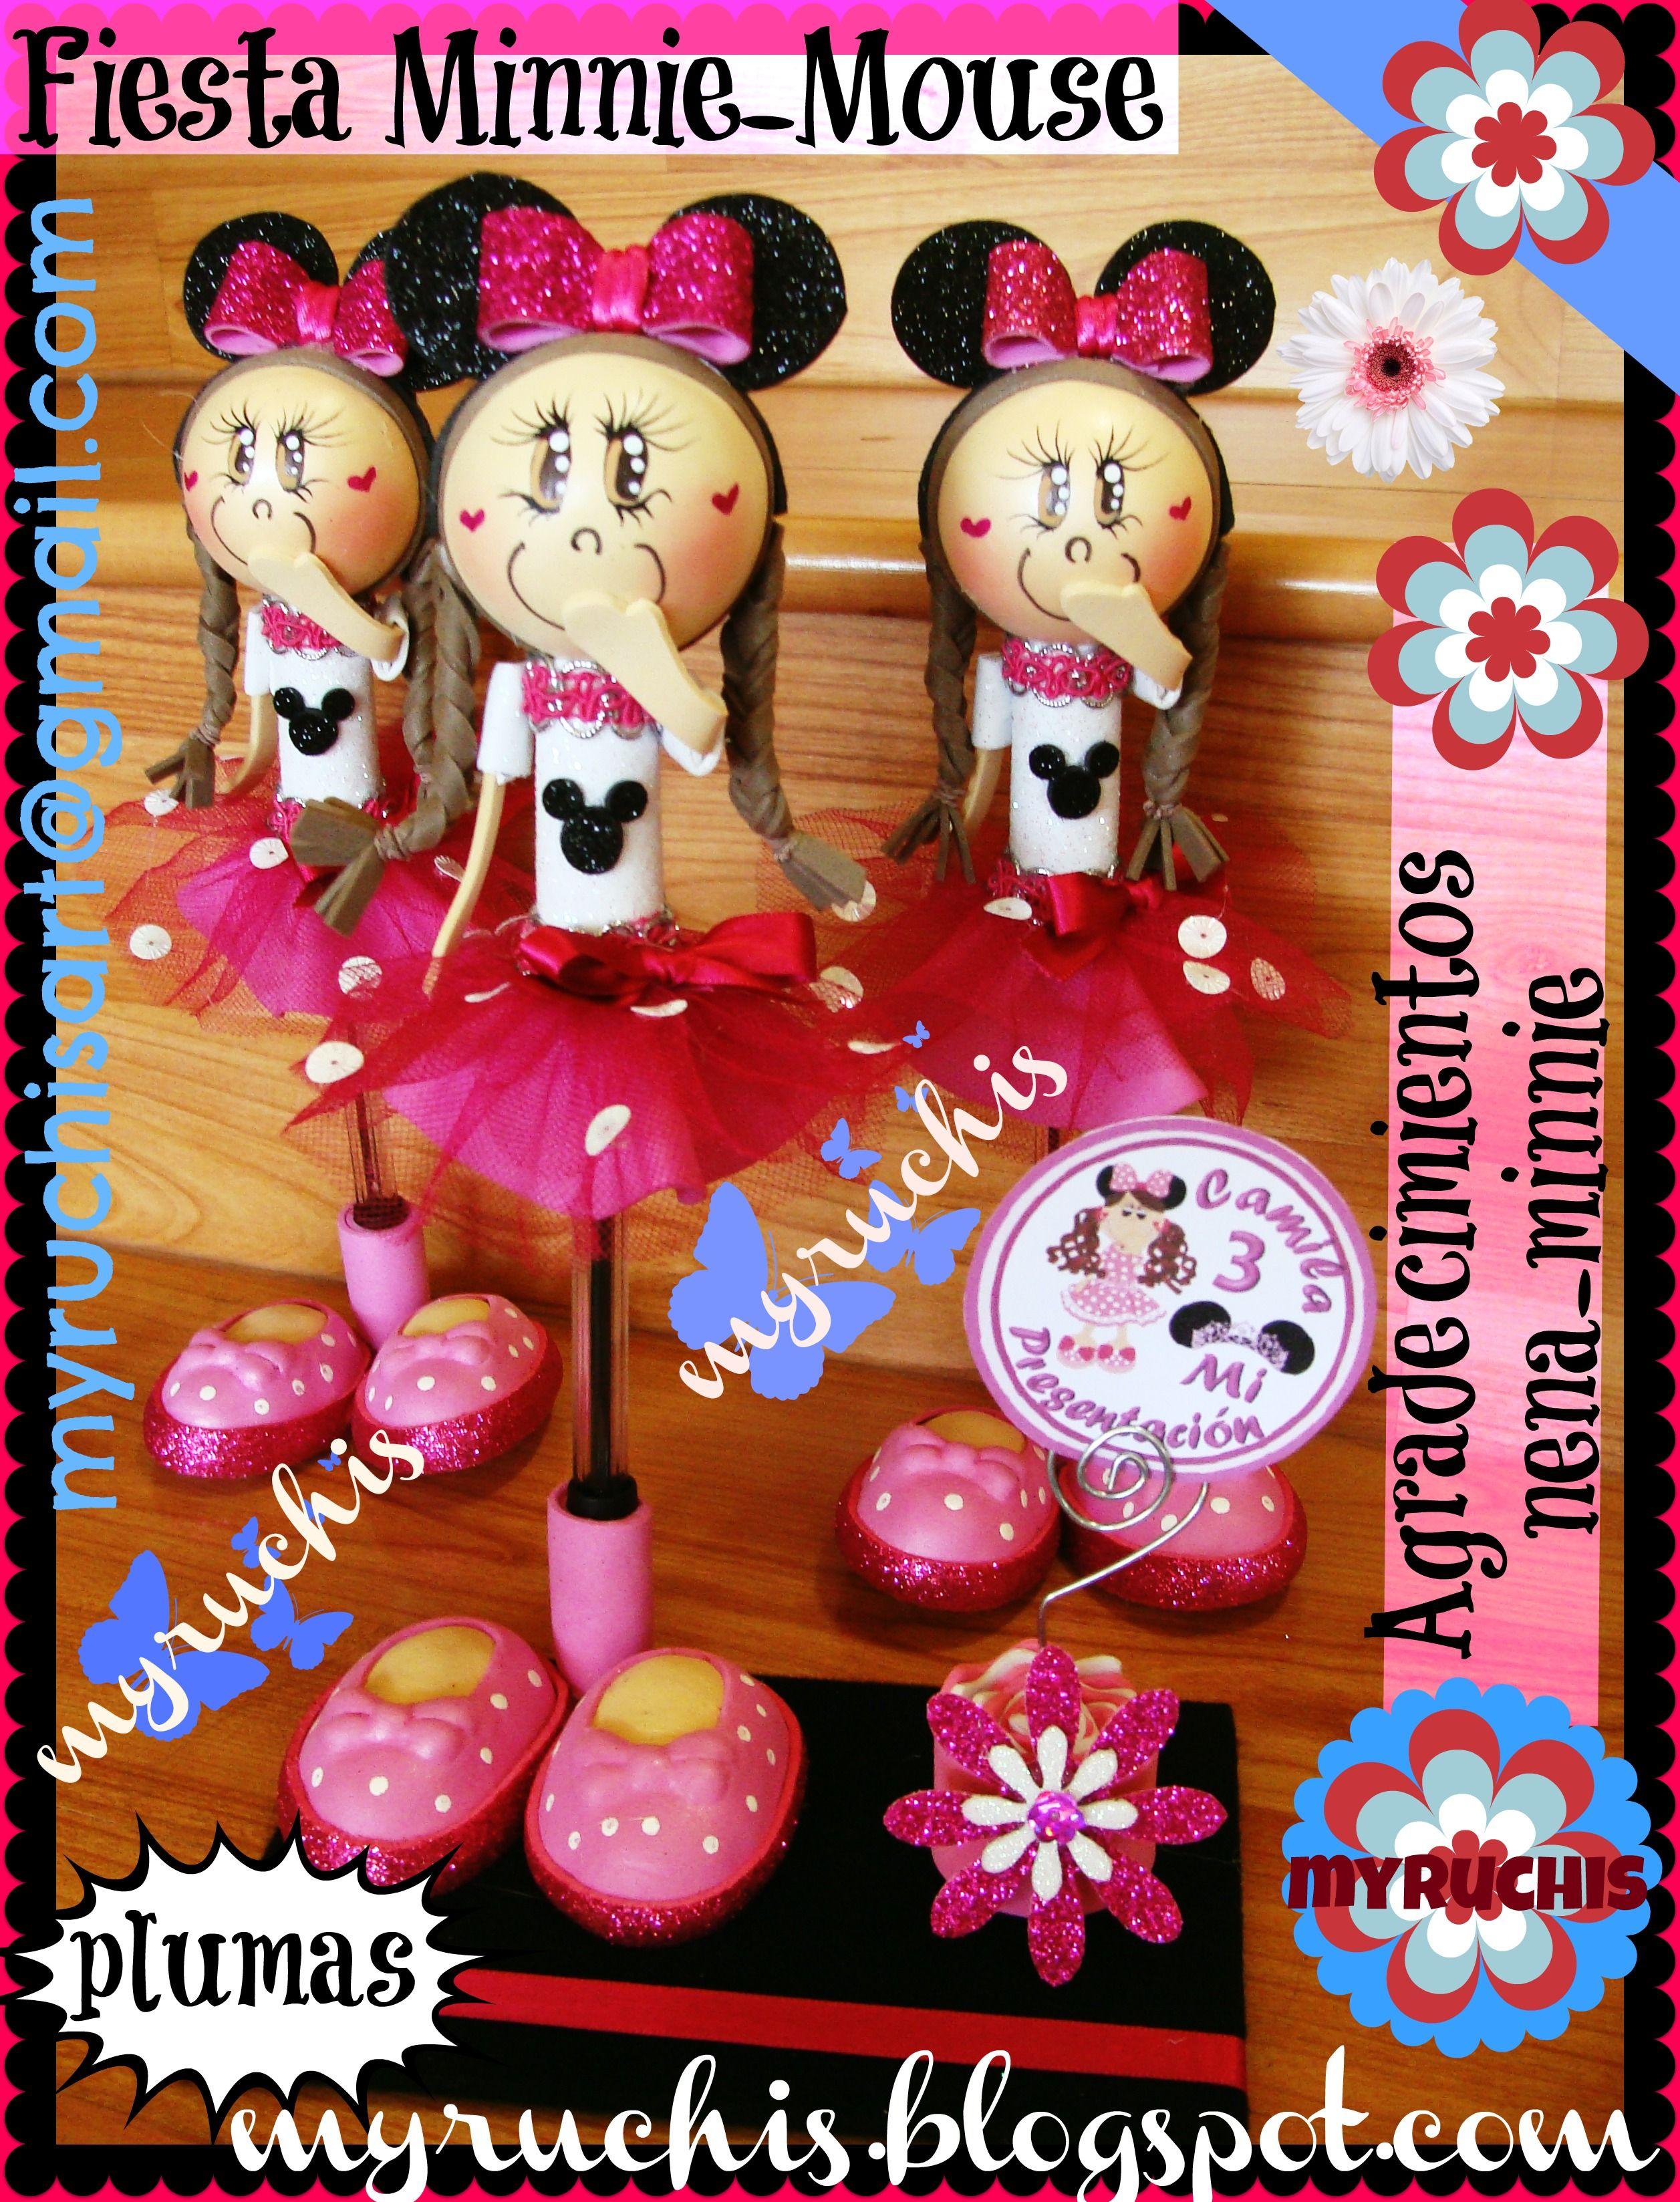 Invitaciones Infantiles. Minnie. sweetmyruchis.blogspot.com